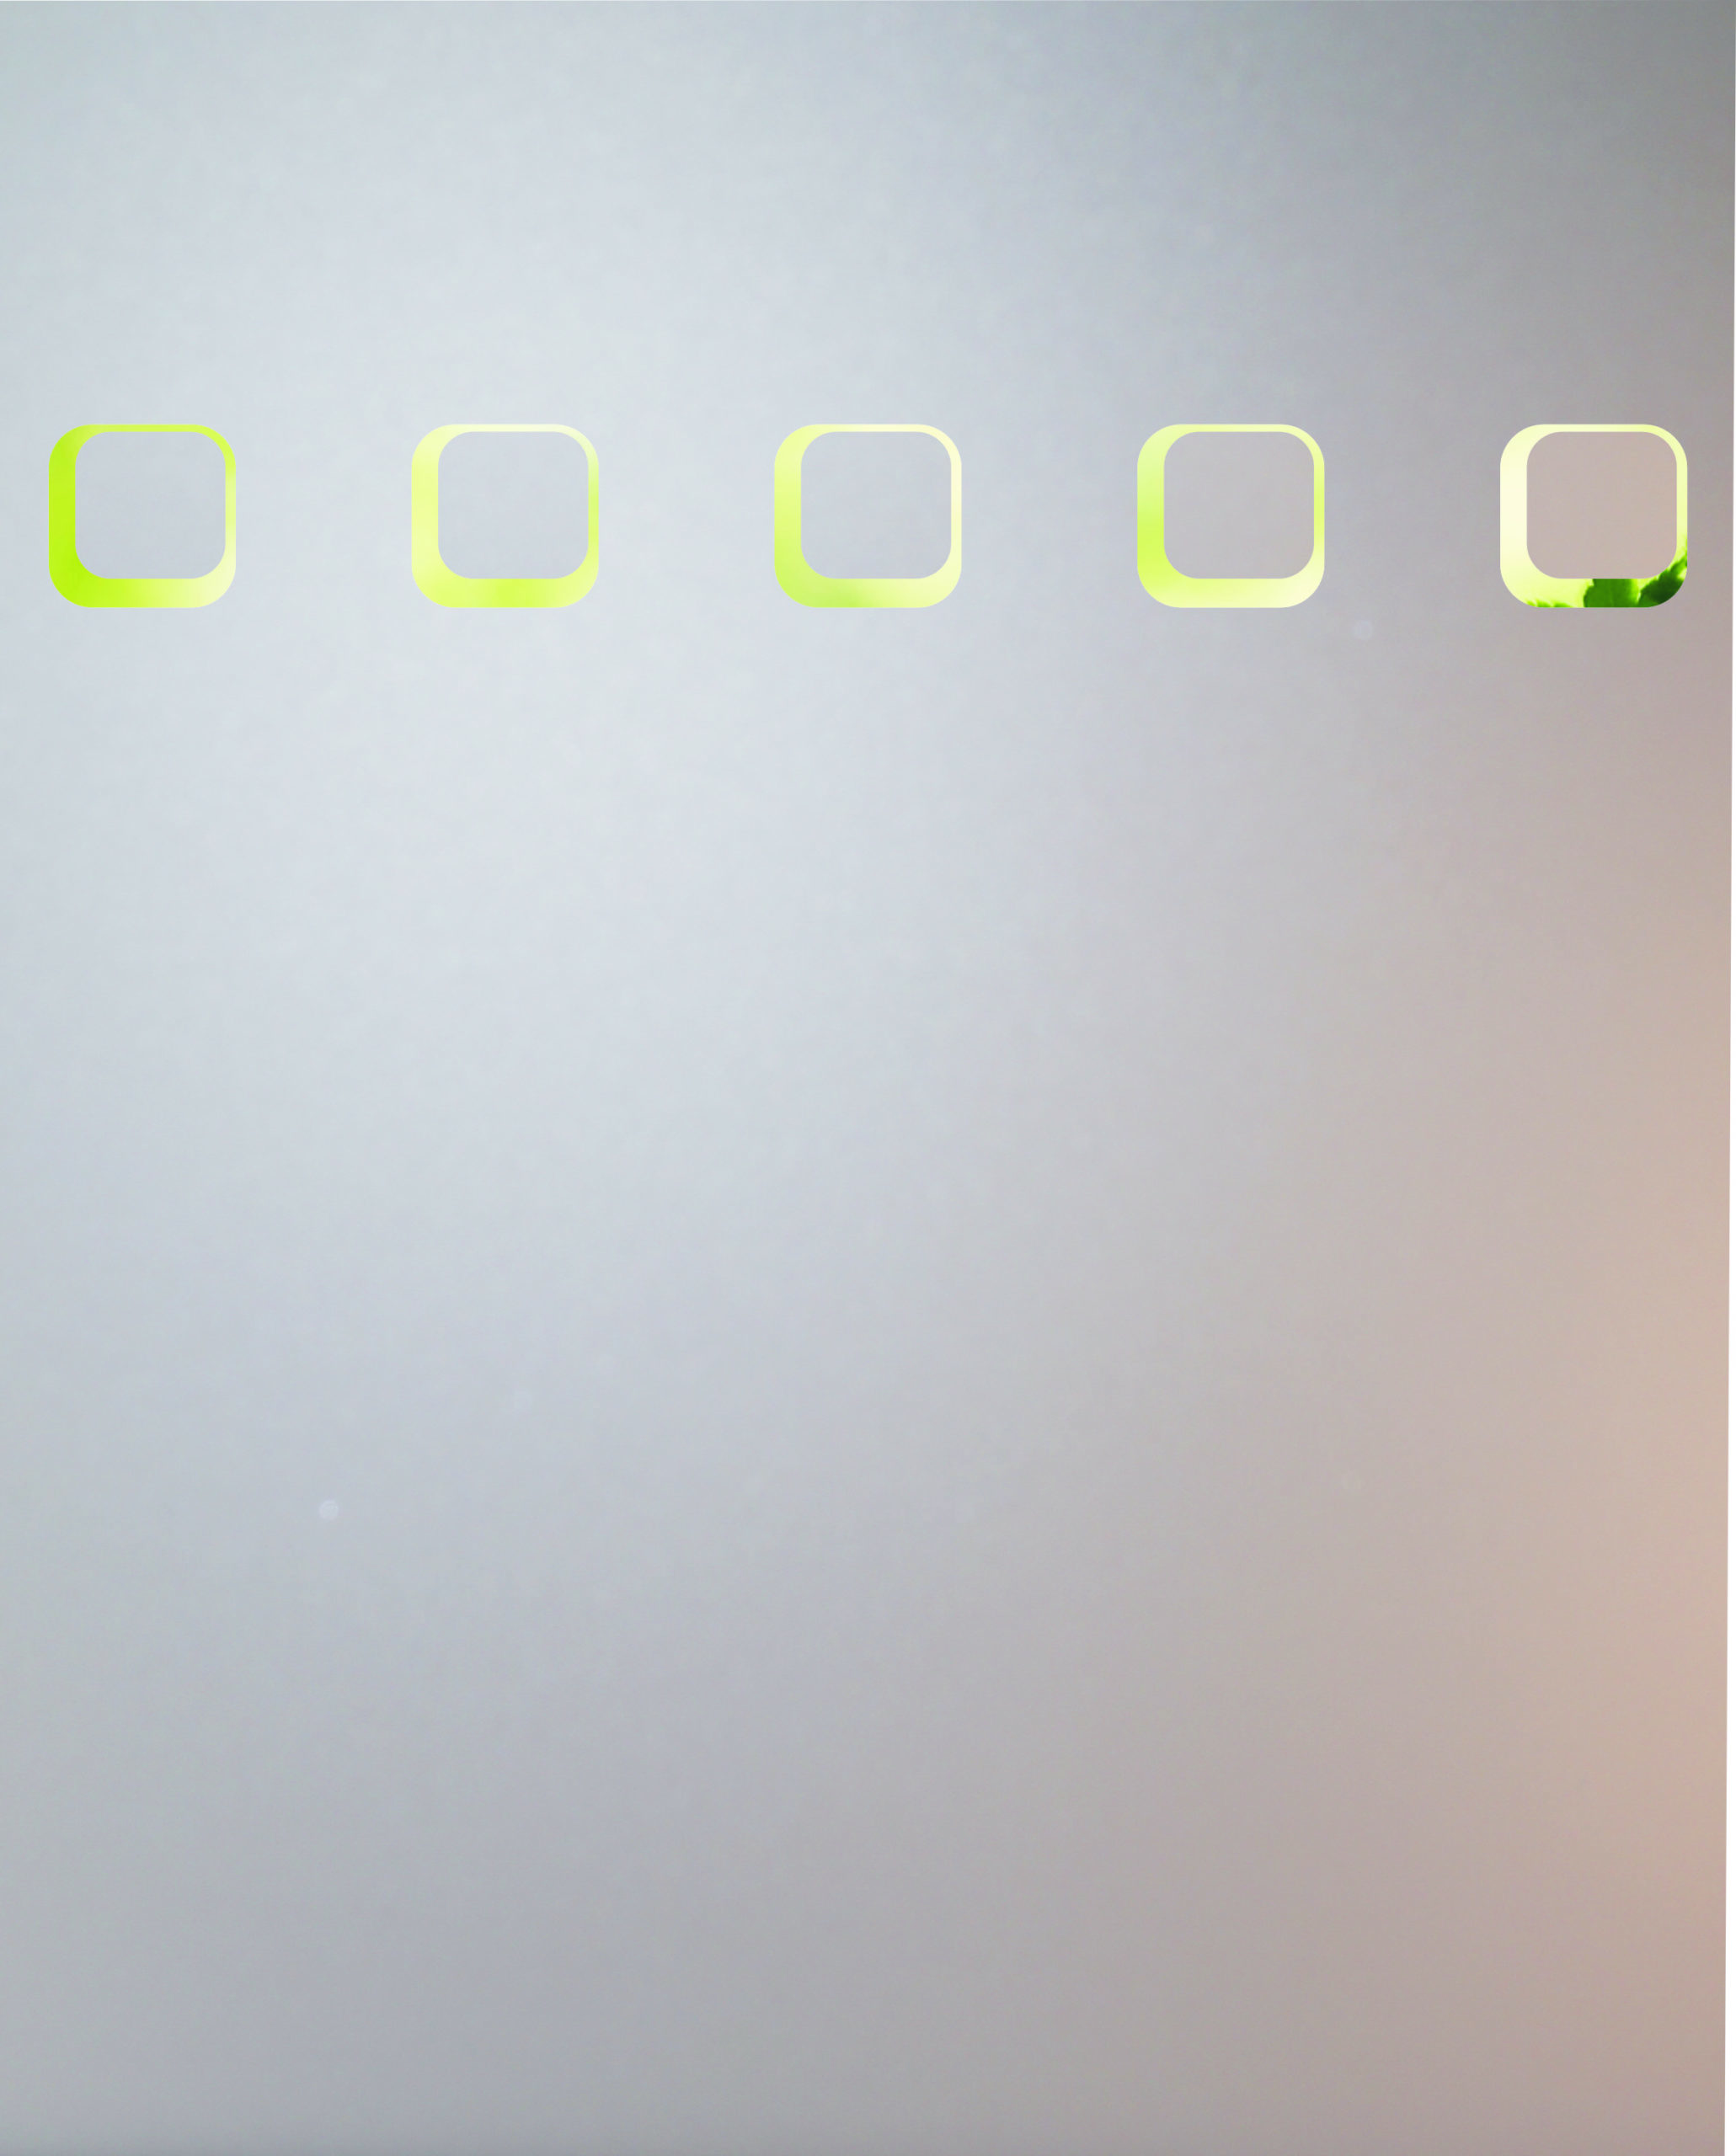 bd-28_2.jpg